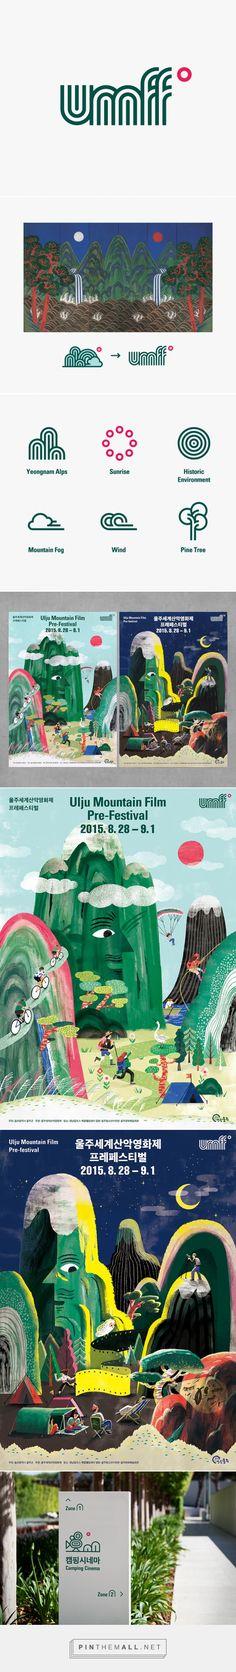 Ulju Mountain Film Festival on Behance - created via https://pinthemall.net